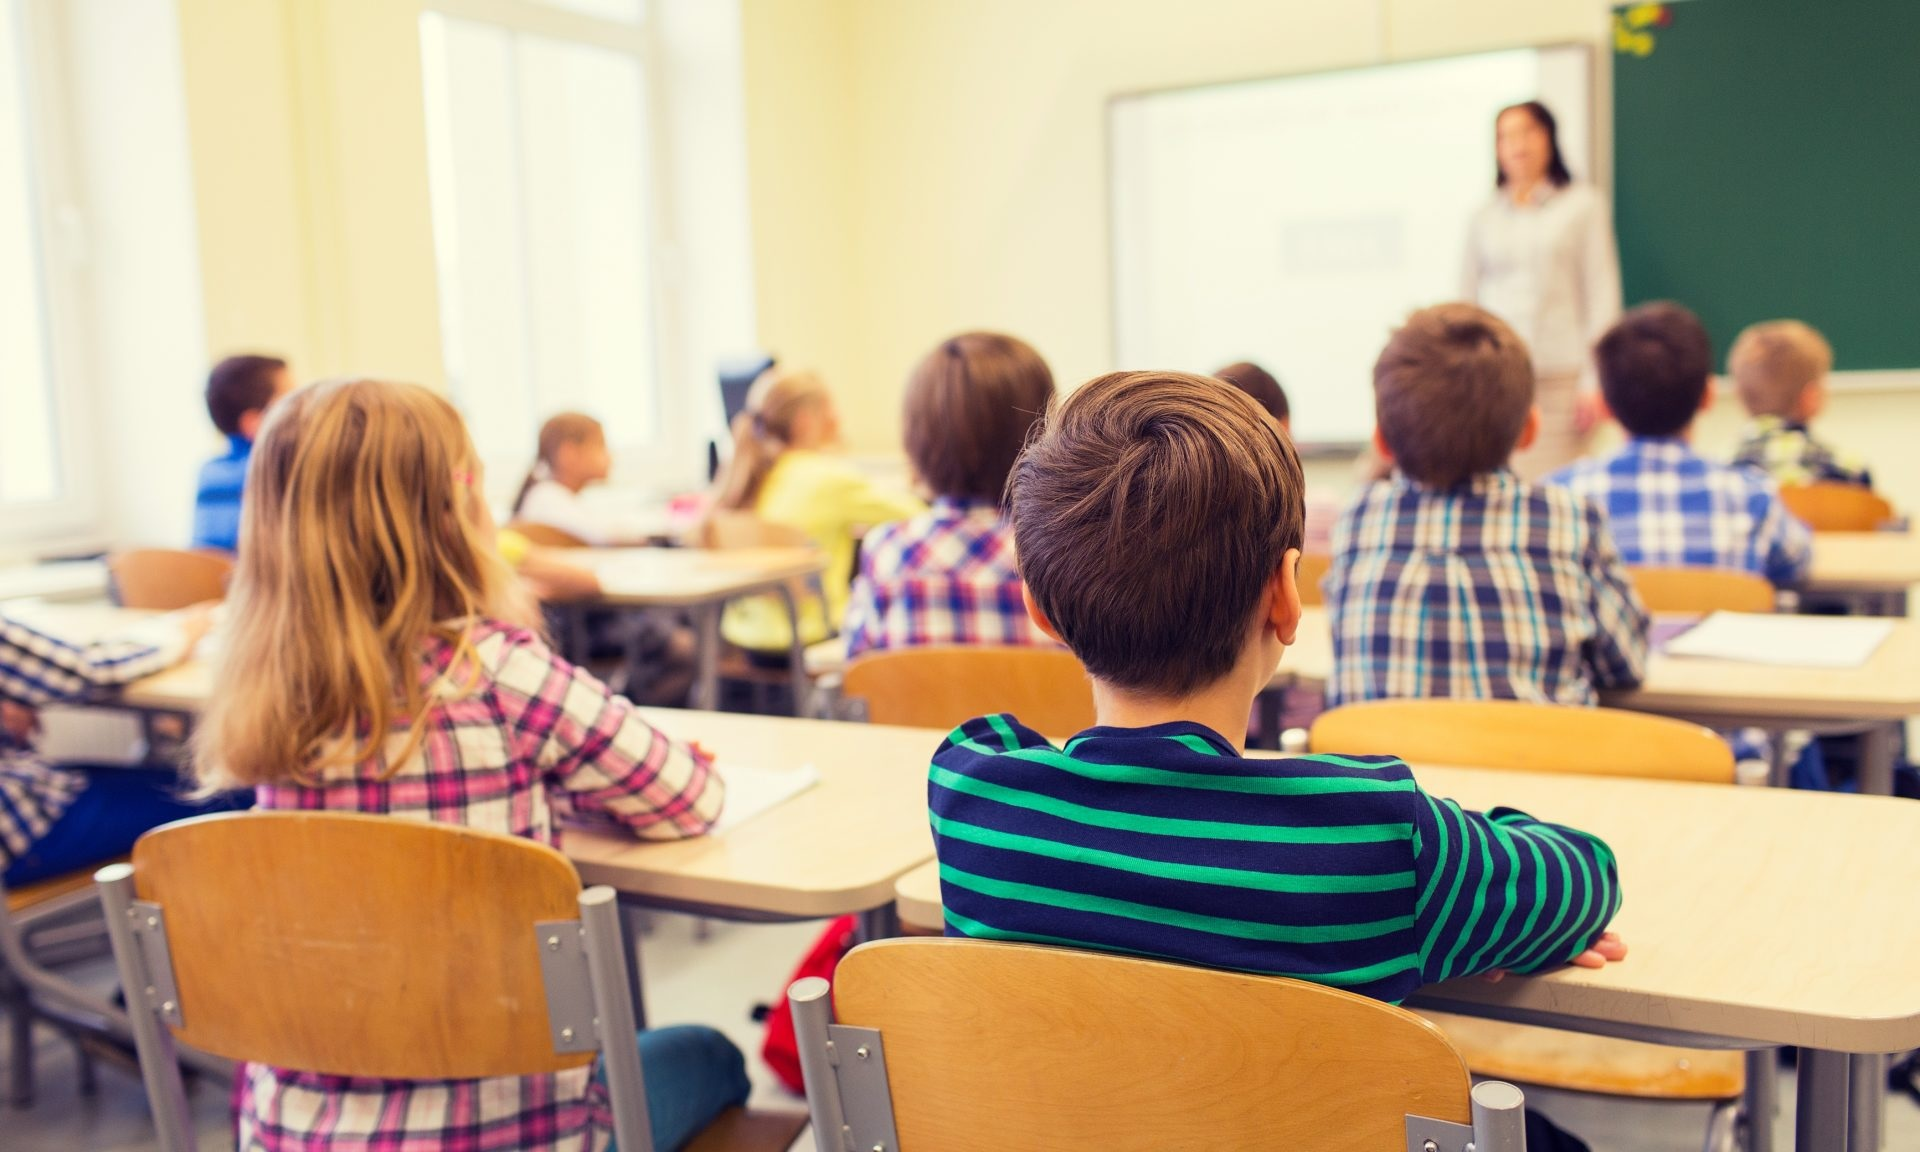 More international school benefits parents should know prior to enrolment